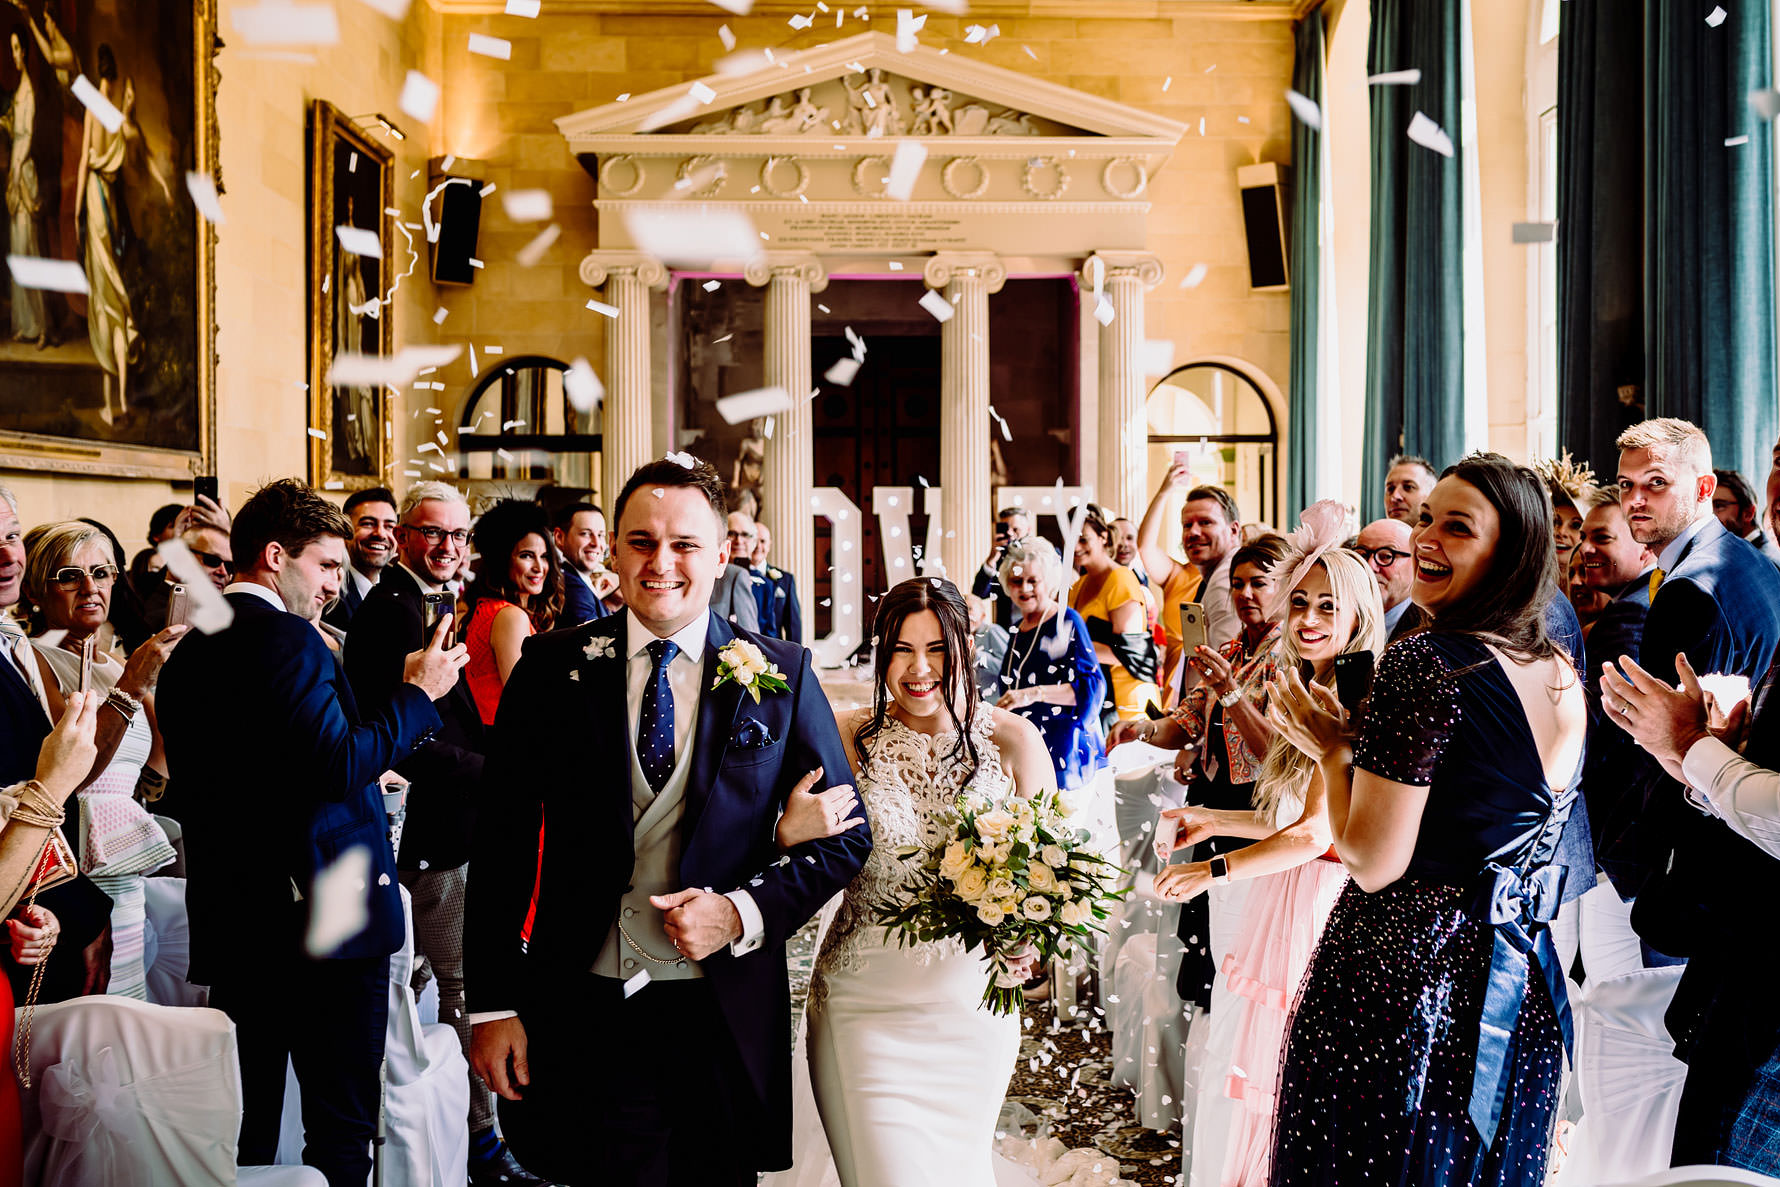 Woburn abbey wedding ceremony